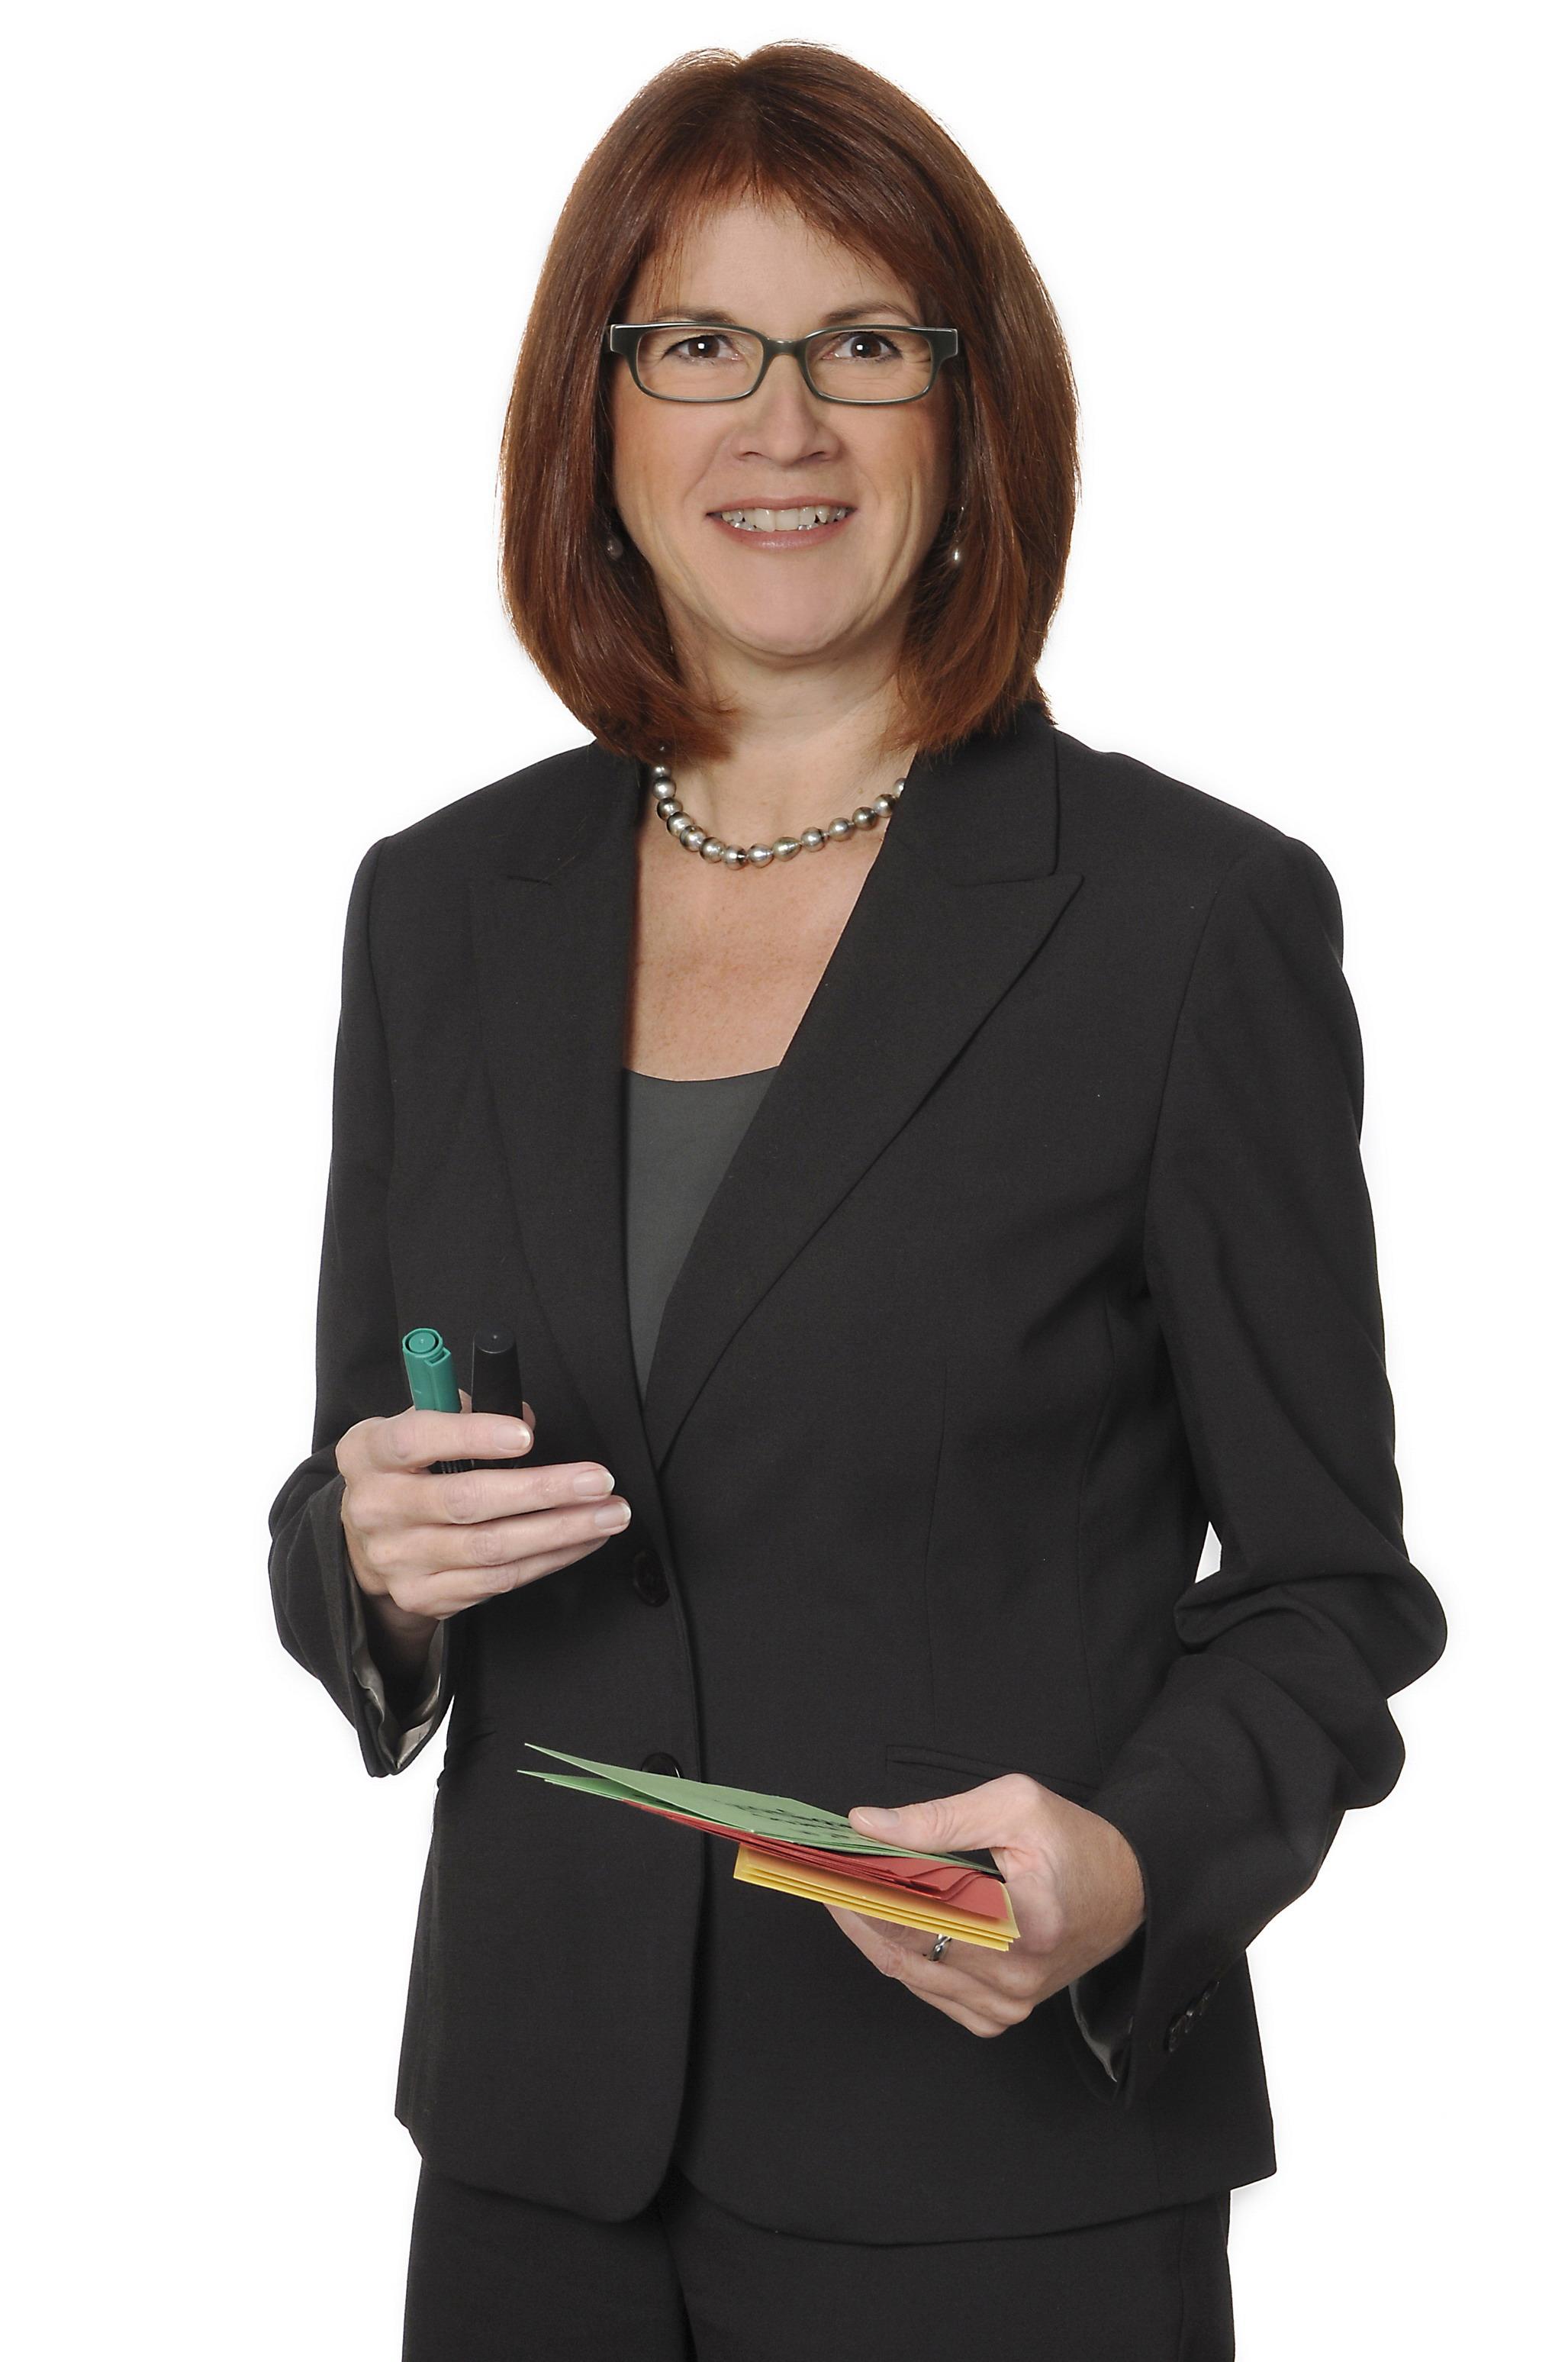 Gudrun Hoehne - intercultural trainer for virtual leadership and virtual teams